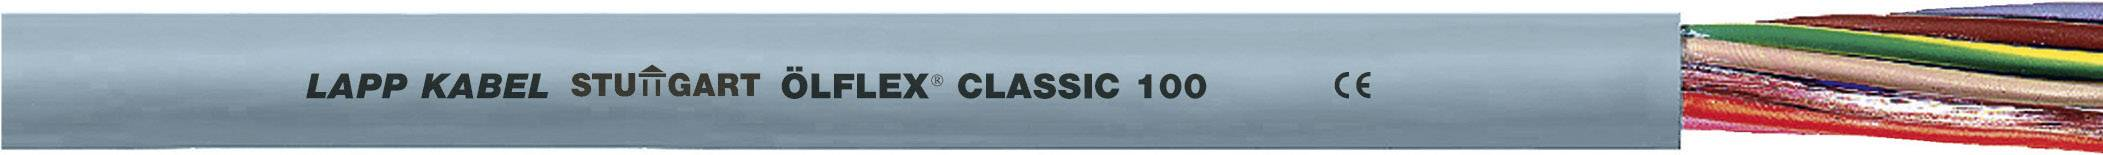 Kabel LappKabel Ölflex CLASSIC 100 5G1 (00100444), PVC, 7,1 mm, 500 V, šedá, 100 m